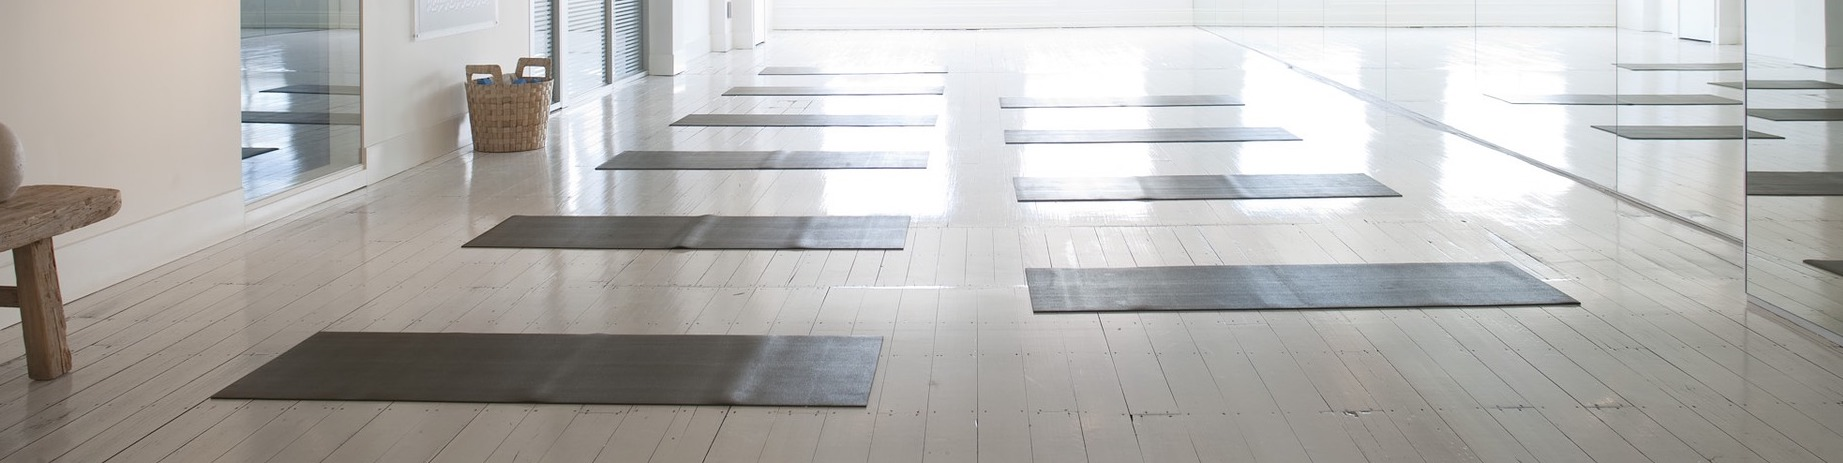 yoga-2959230_1920-2